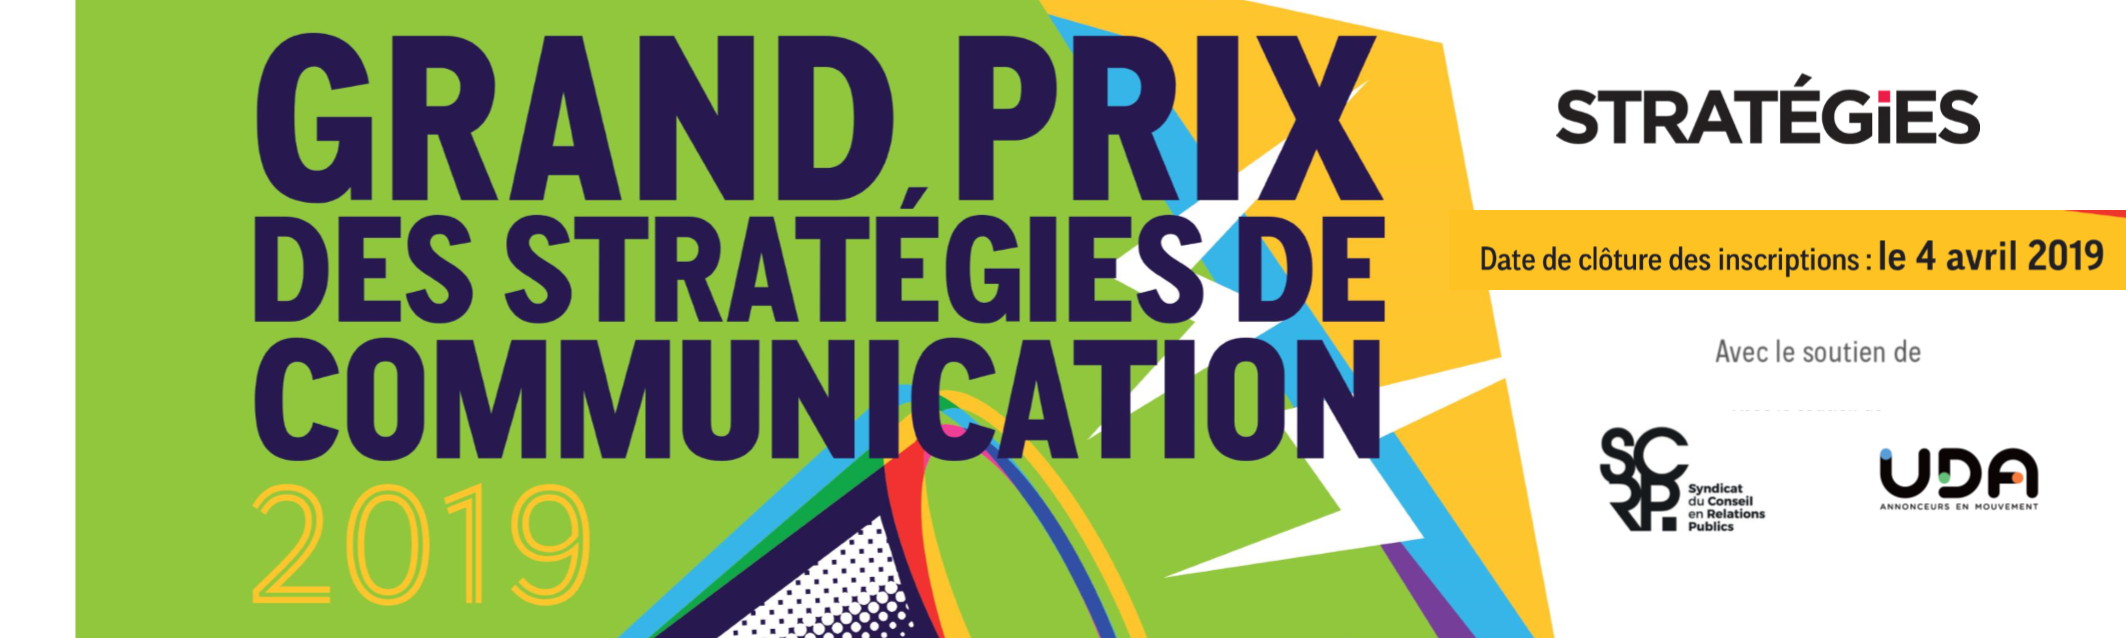 Grand Prix Stratégies des Relations Publics